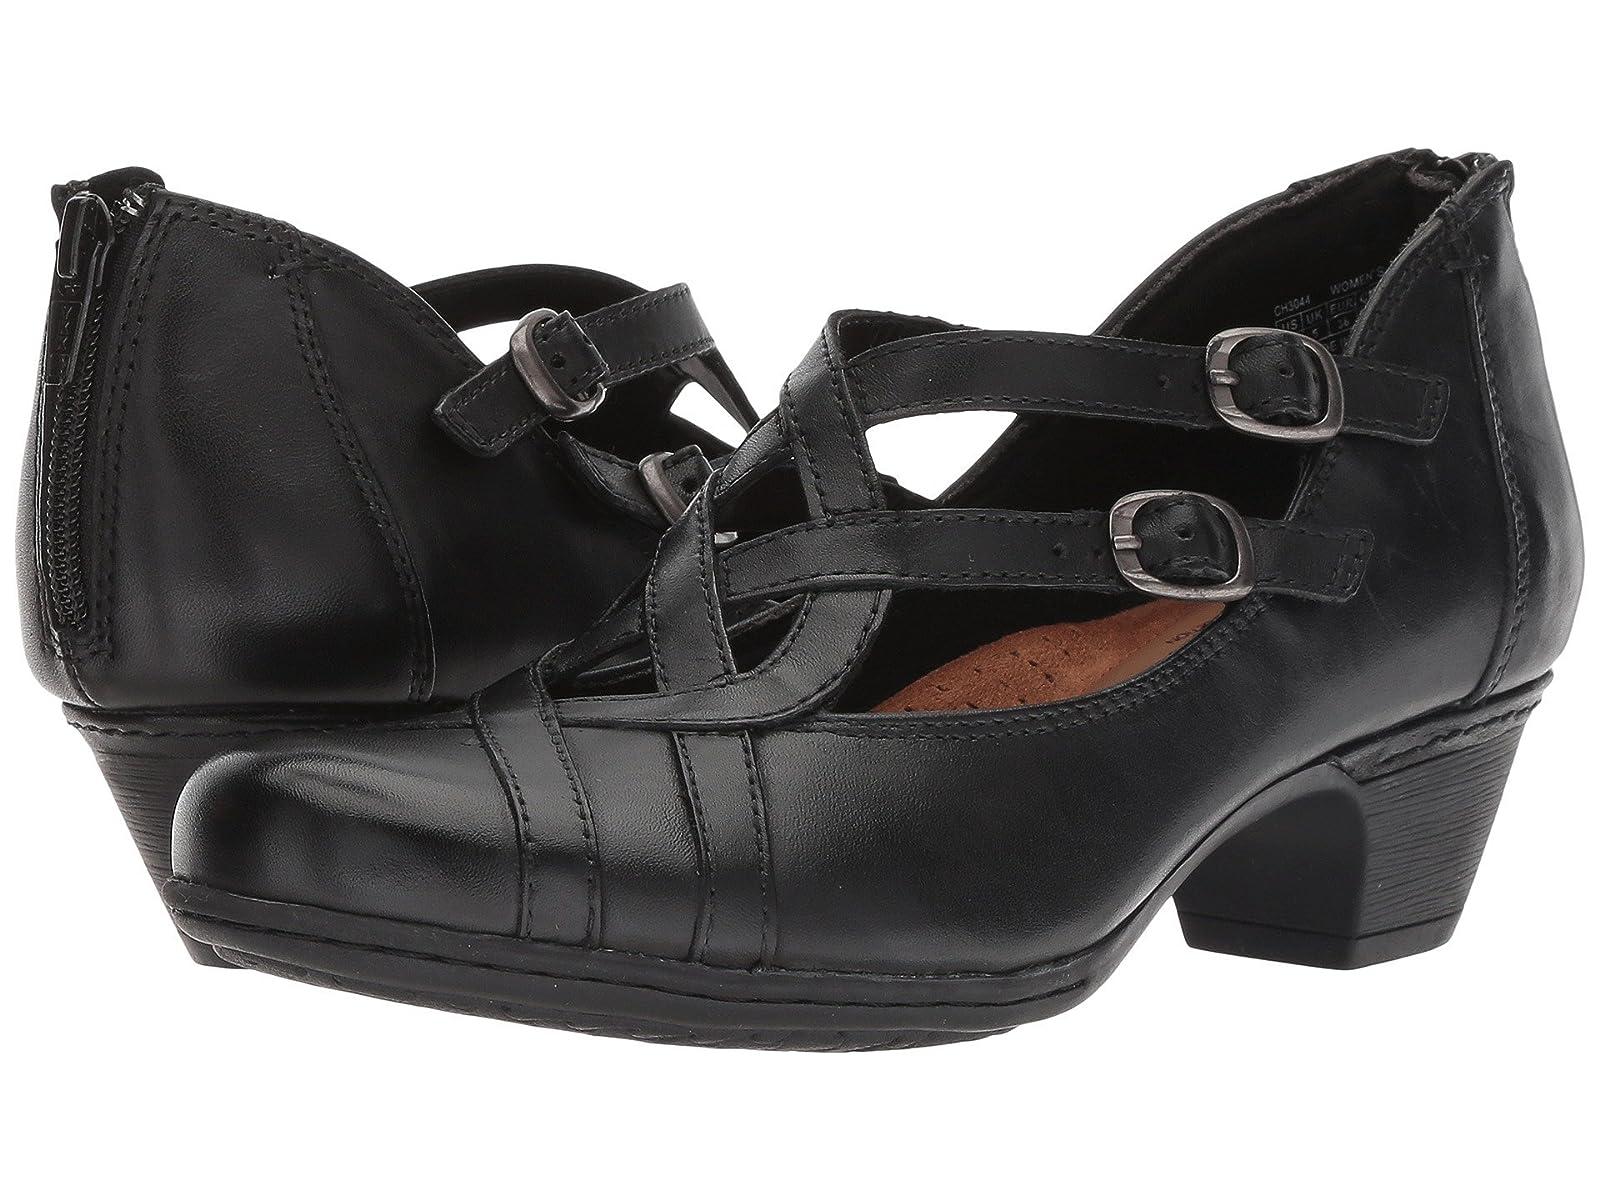 Rockport Cobb Hill Collection Cobb Hill Abbott Curvy ShoeAtmospheric grades have affordable shoes